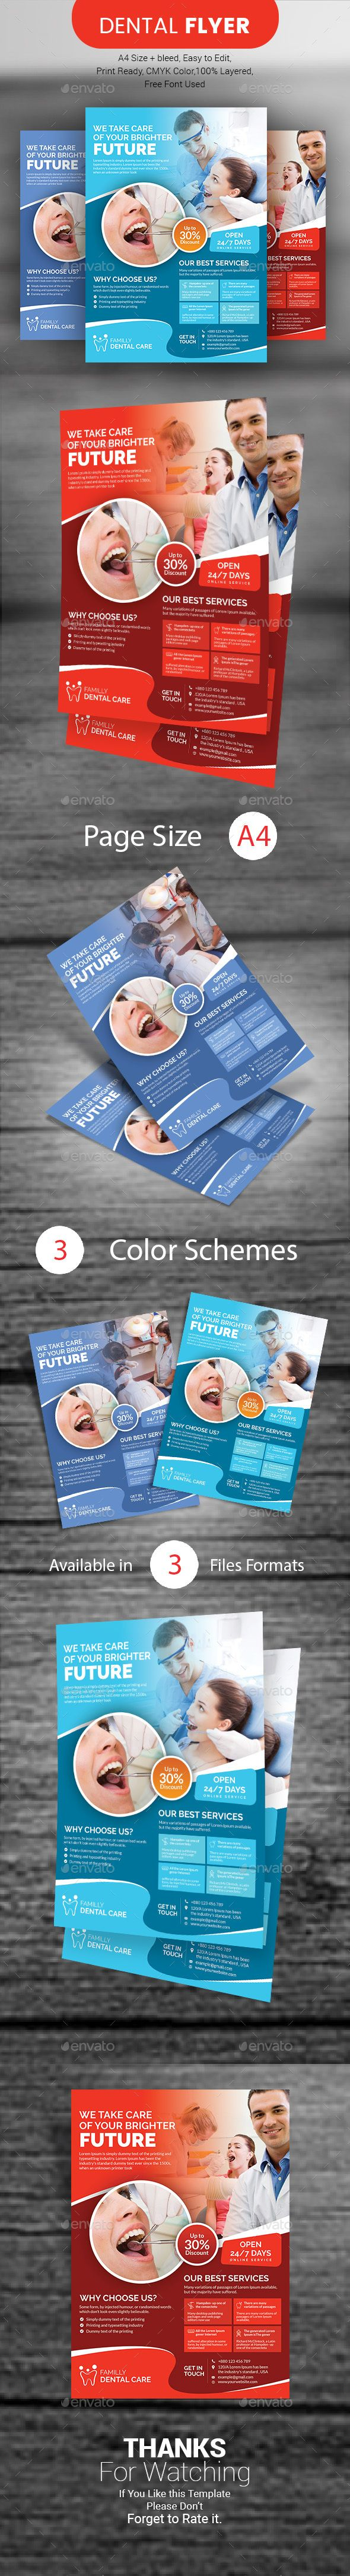 dental flyer corporate flyers